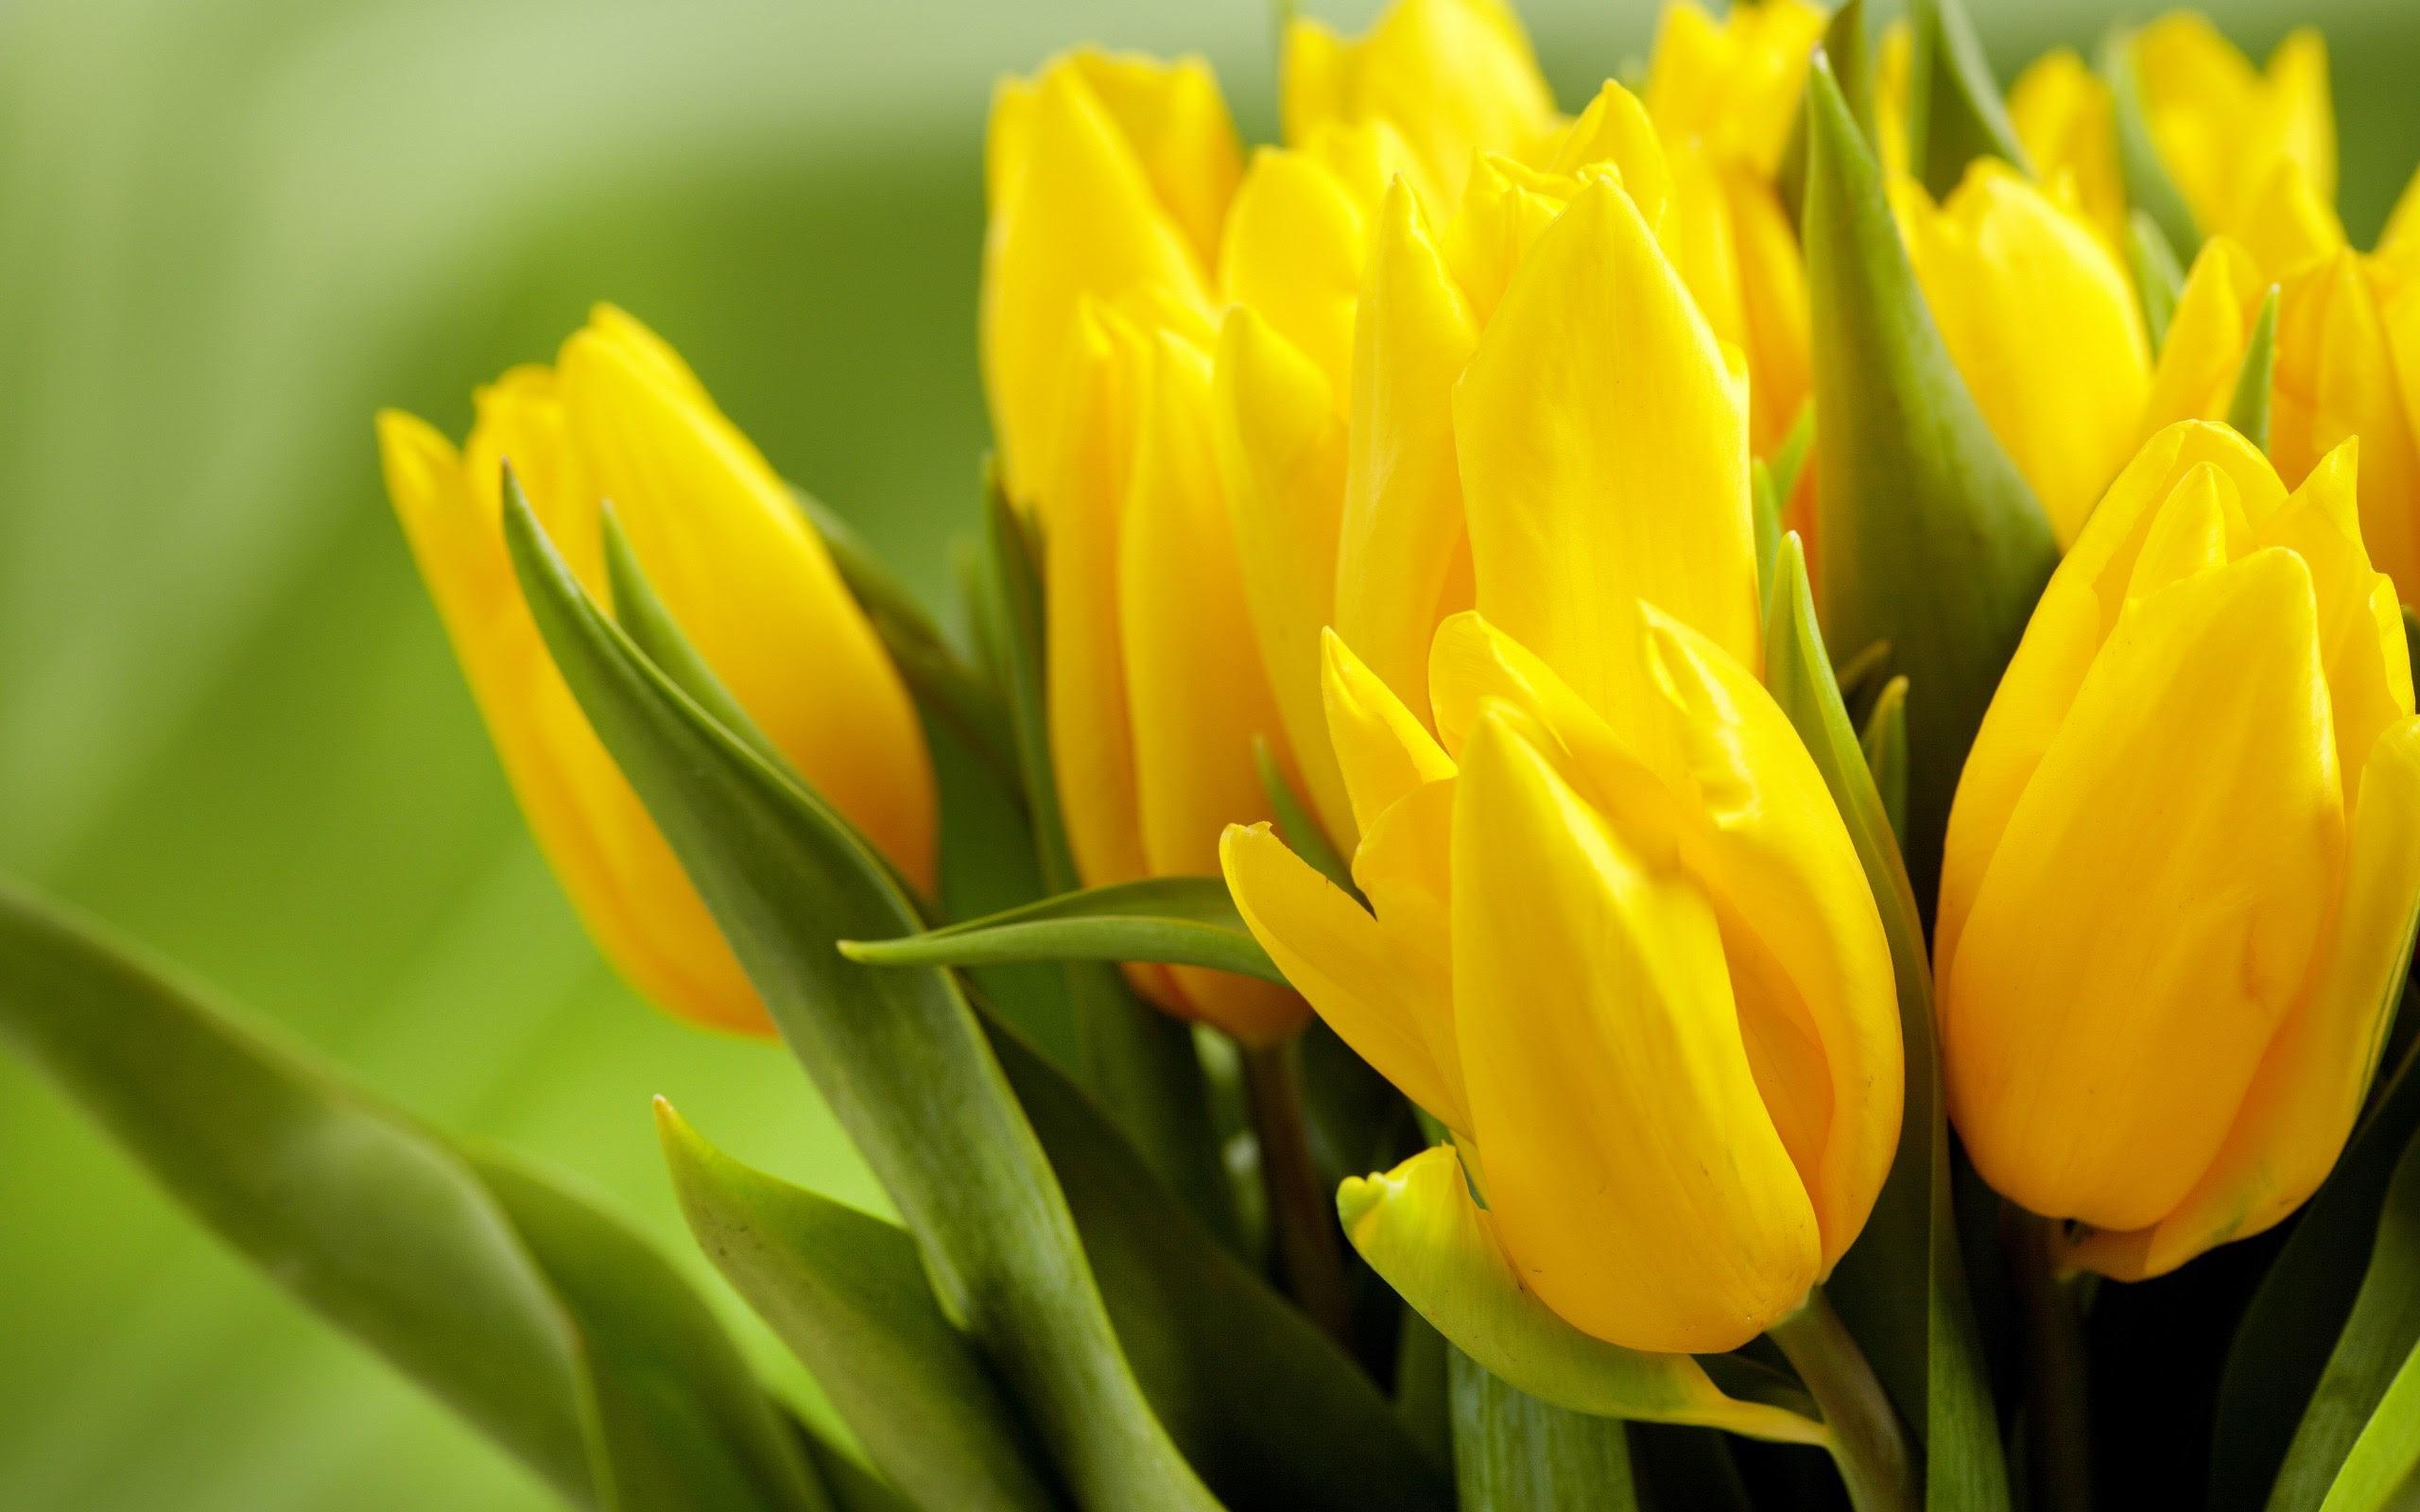 Yellow Flowers Hd Wallpaper 2560x1600 23763